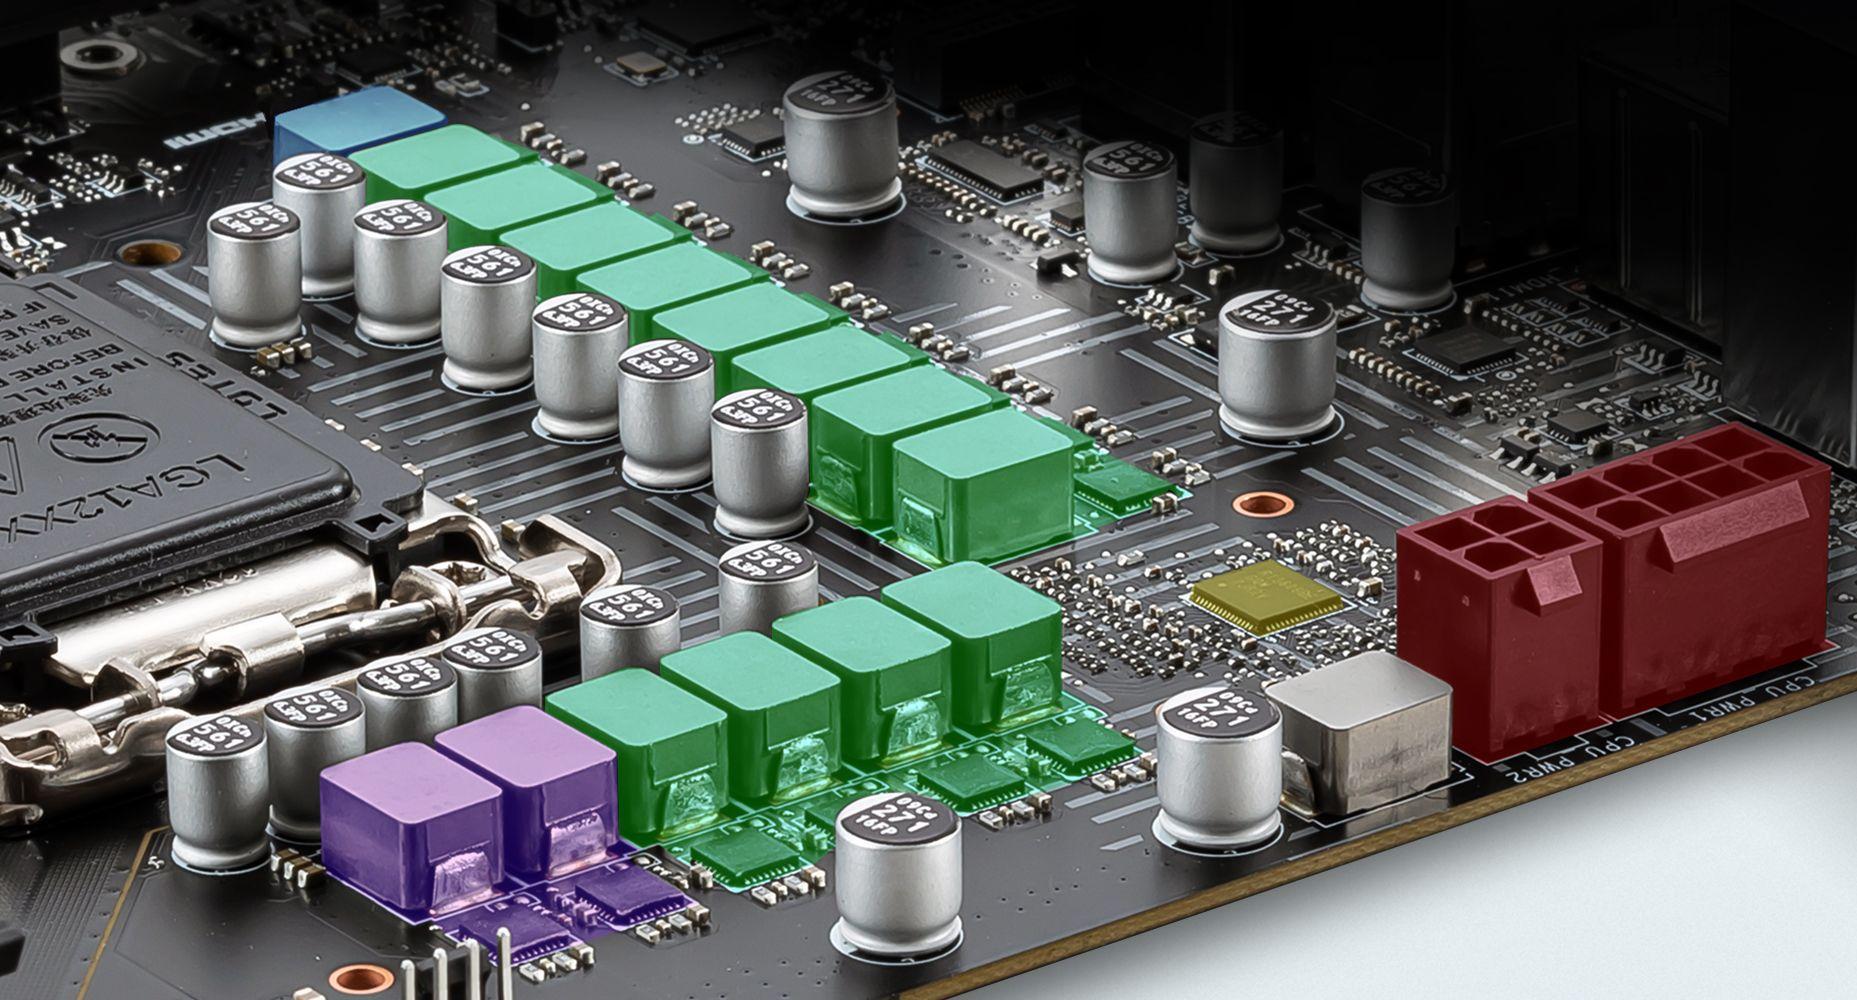 MSI Z590-A PRO 2 +1 DUET RAIL POWER SYSTEM